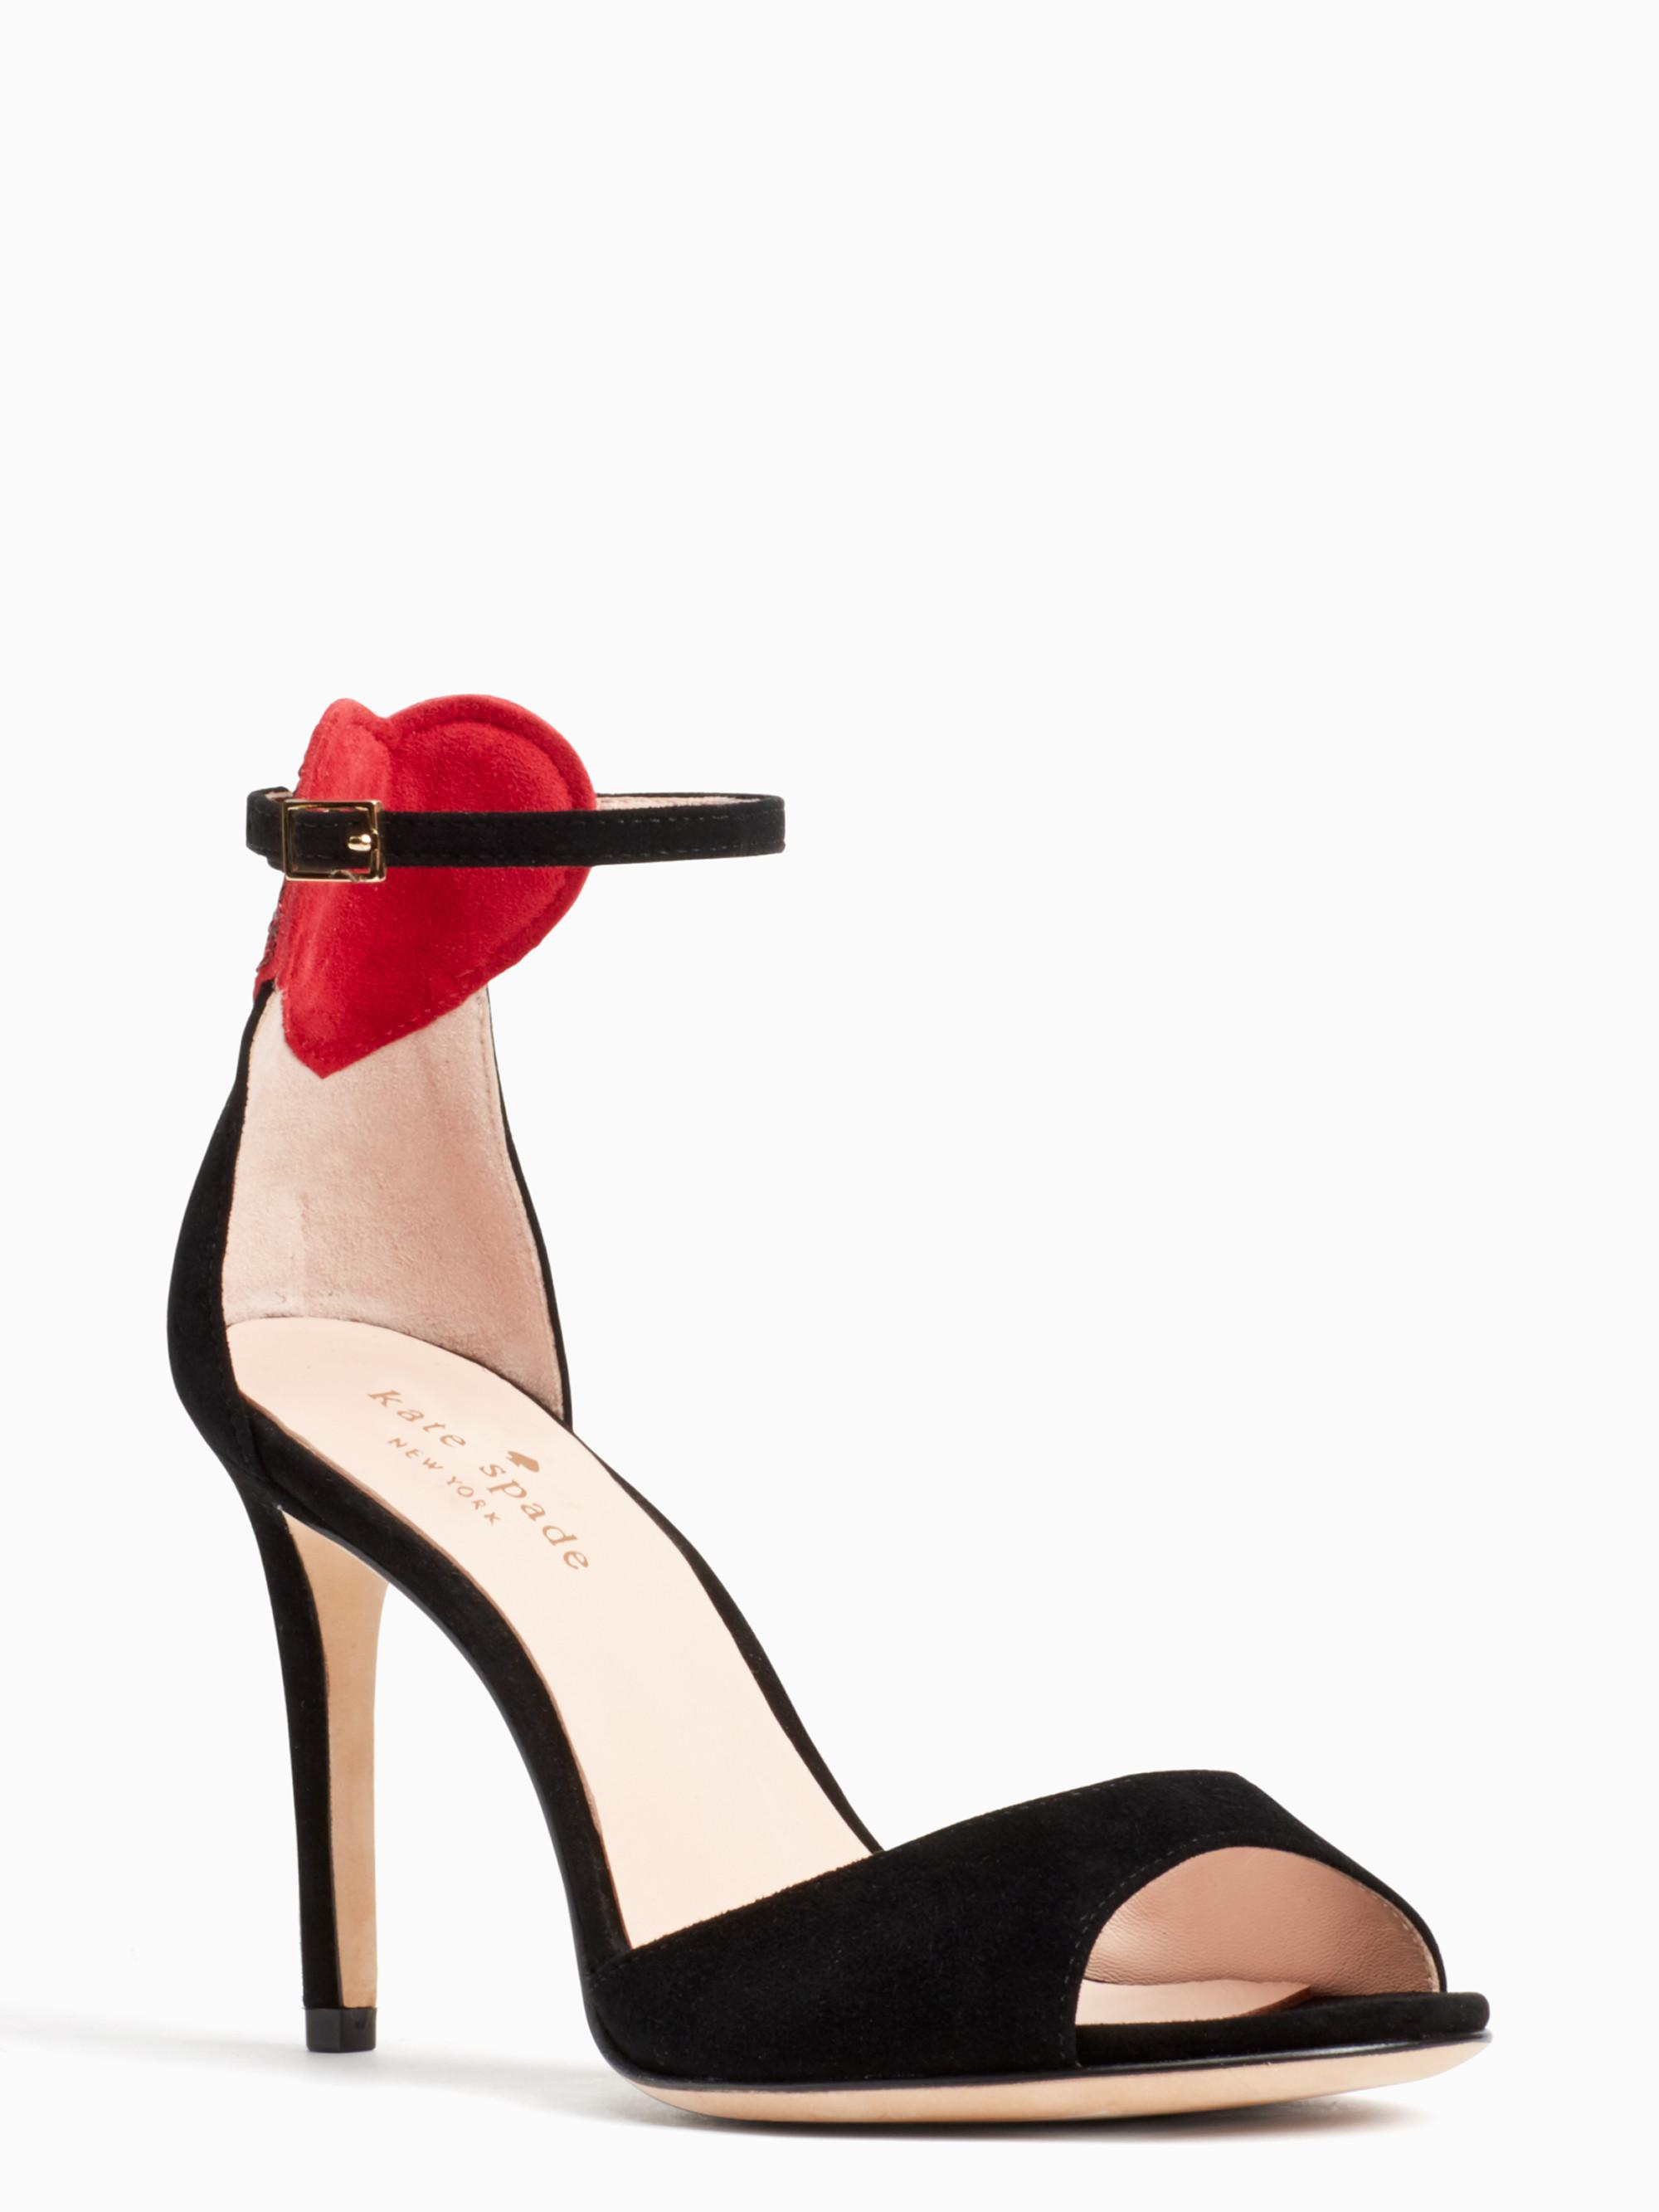 a578afad35f4 Kate spade olidah heels in black lyst jpg 2000x2666 Kate spade lynne heels